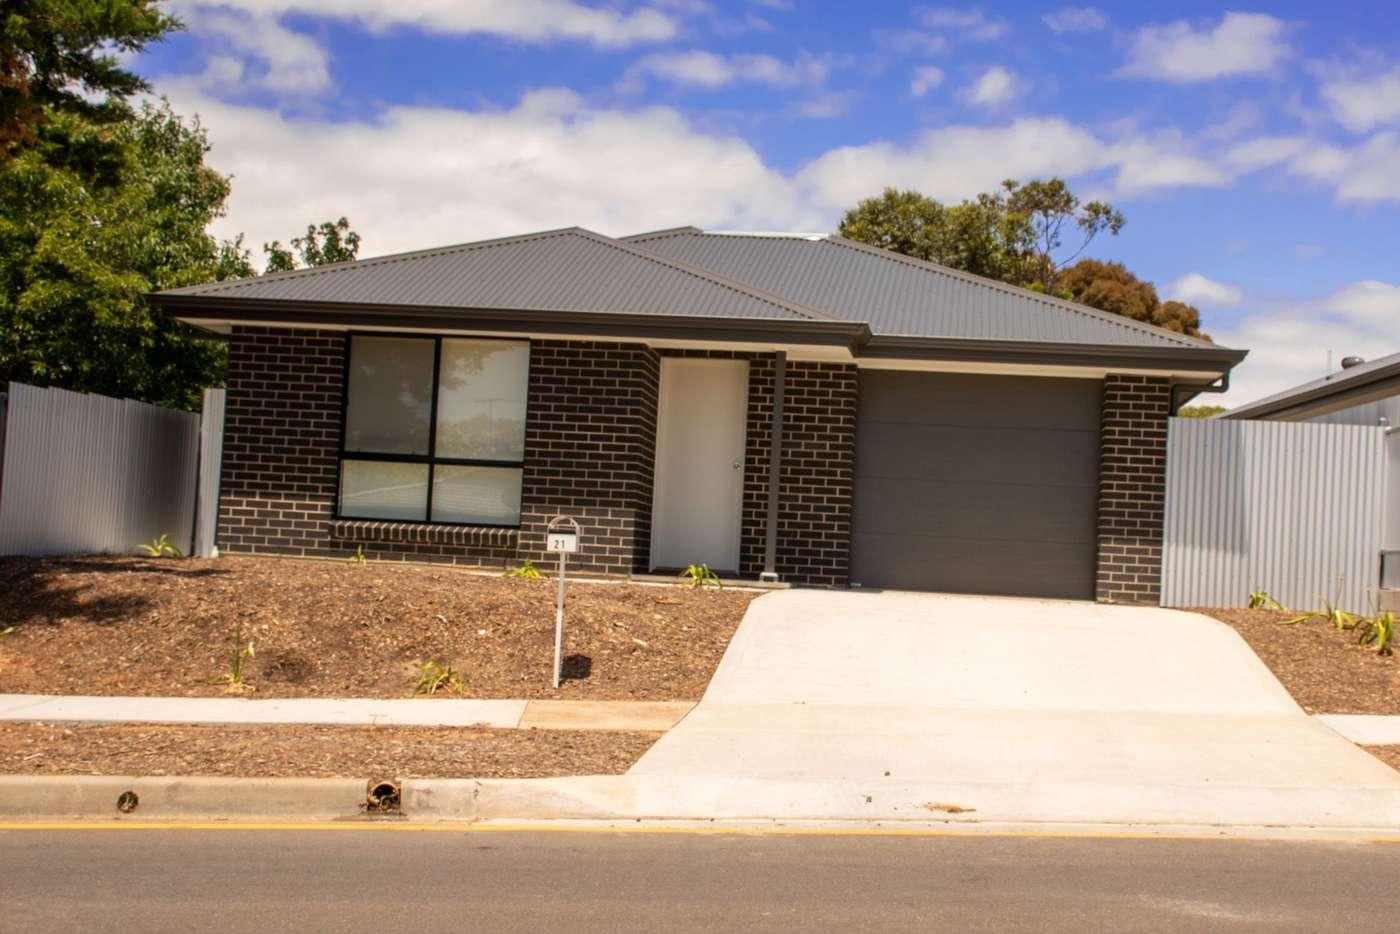 Main view of Homely house listing, 21 Wangara Avenue, Morphett Vale SA 5162